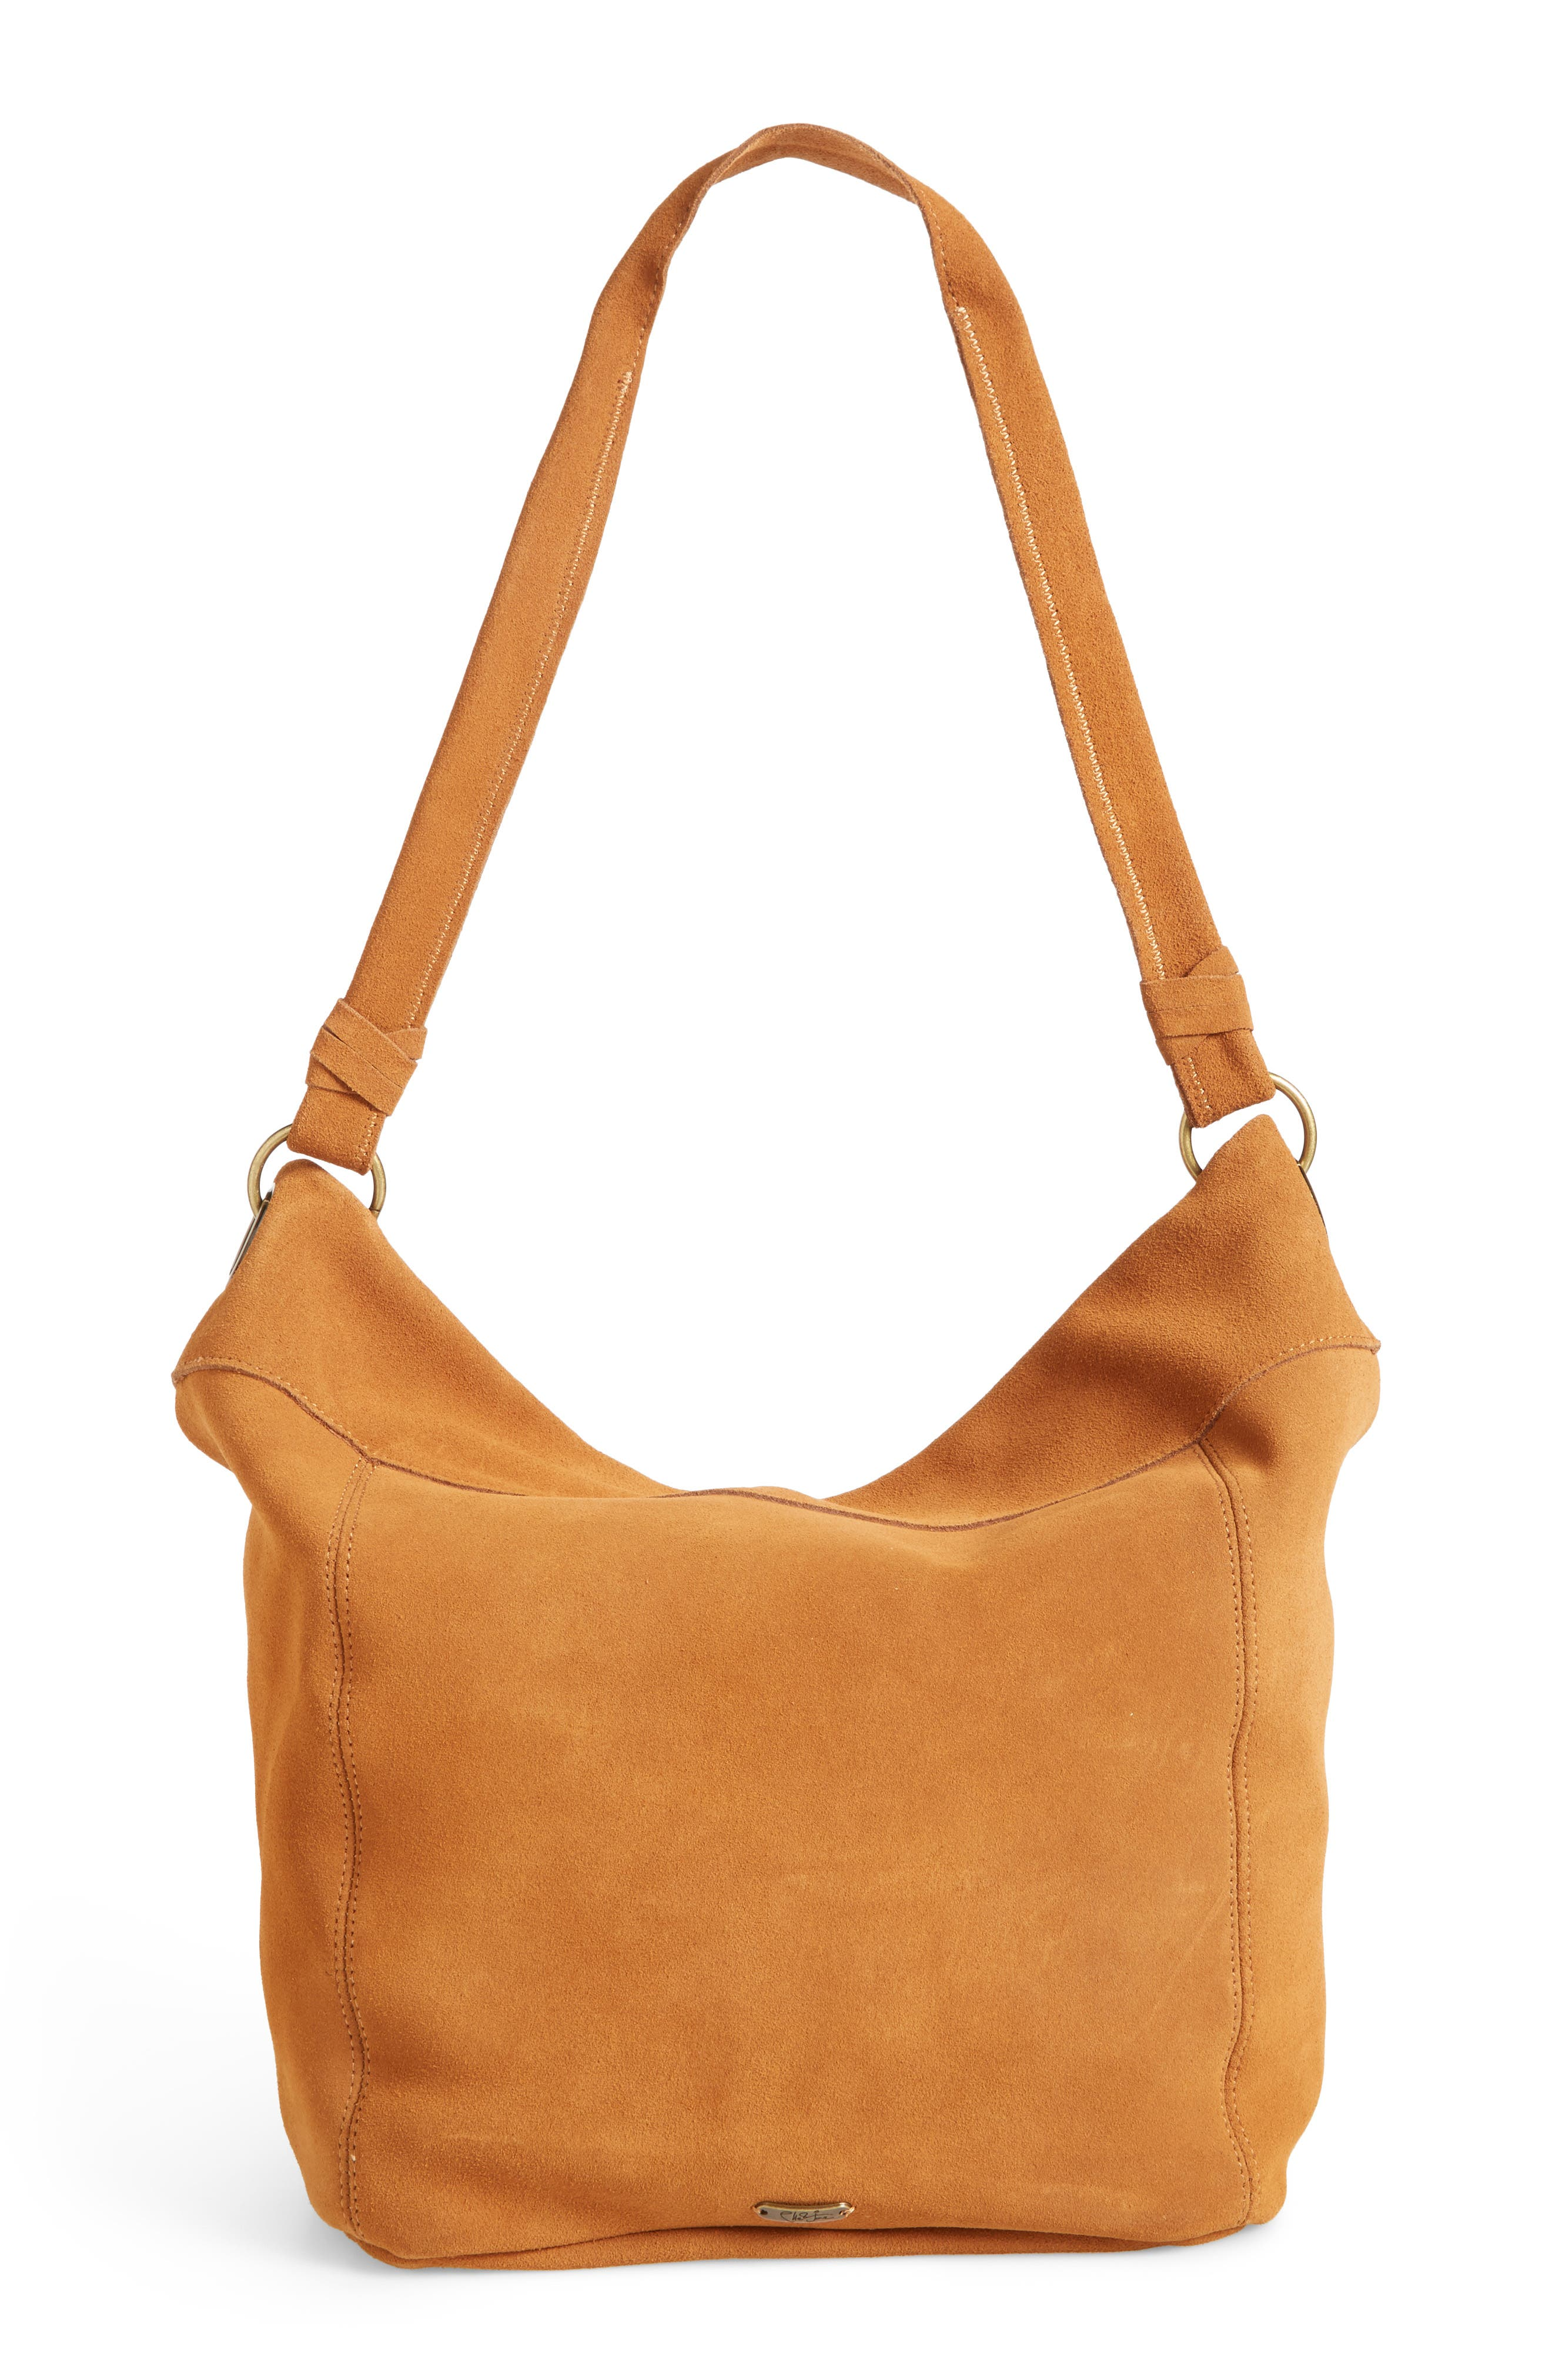 e8aca5b42 Elle & Jae Gypset Handbags & Wallets for Women | Nordstrom